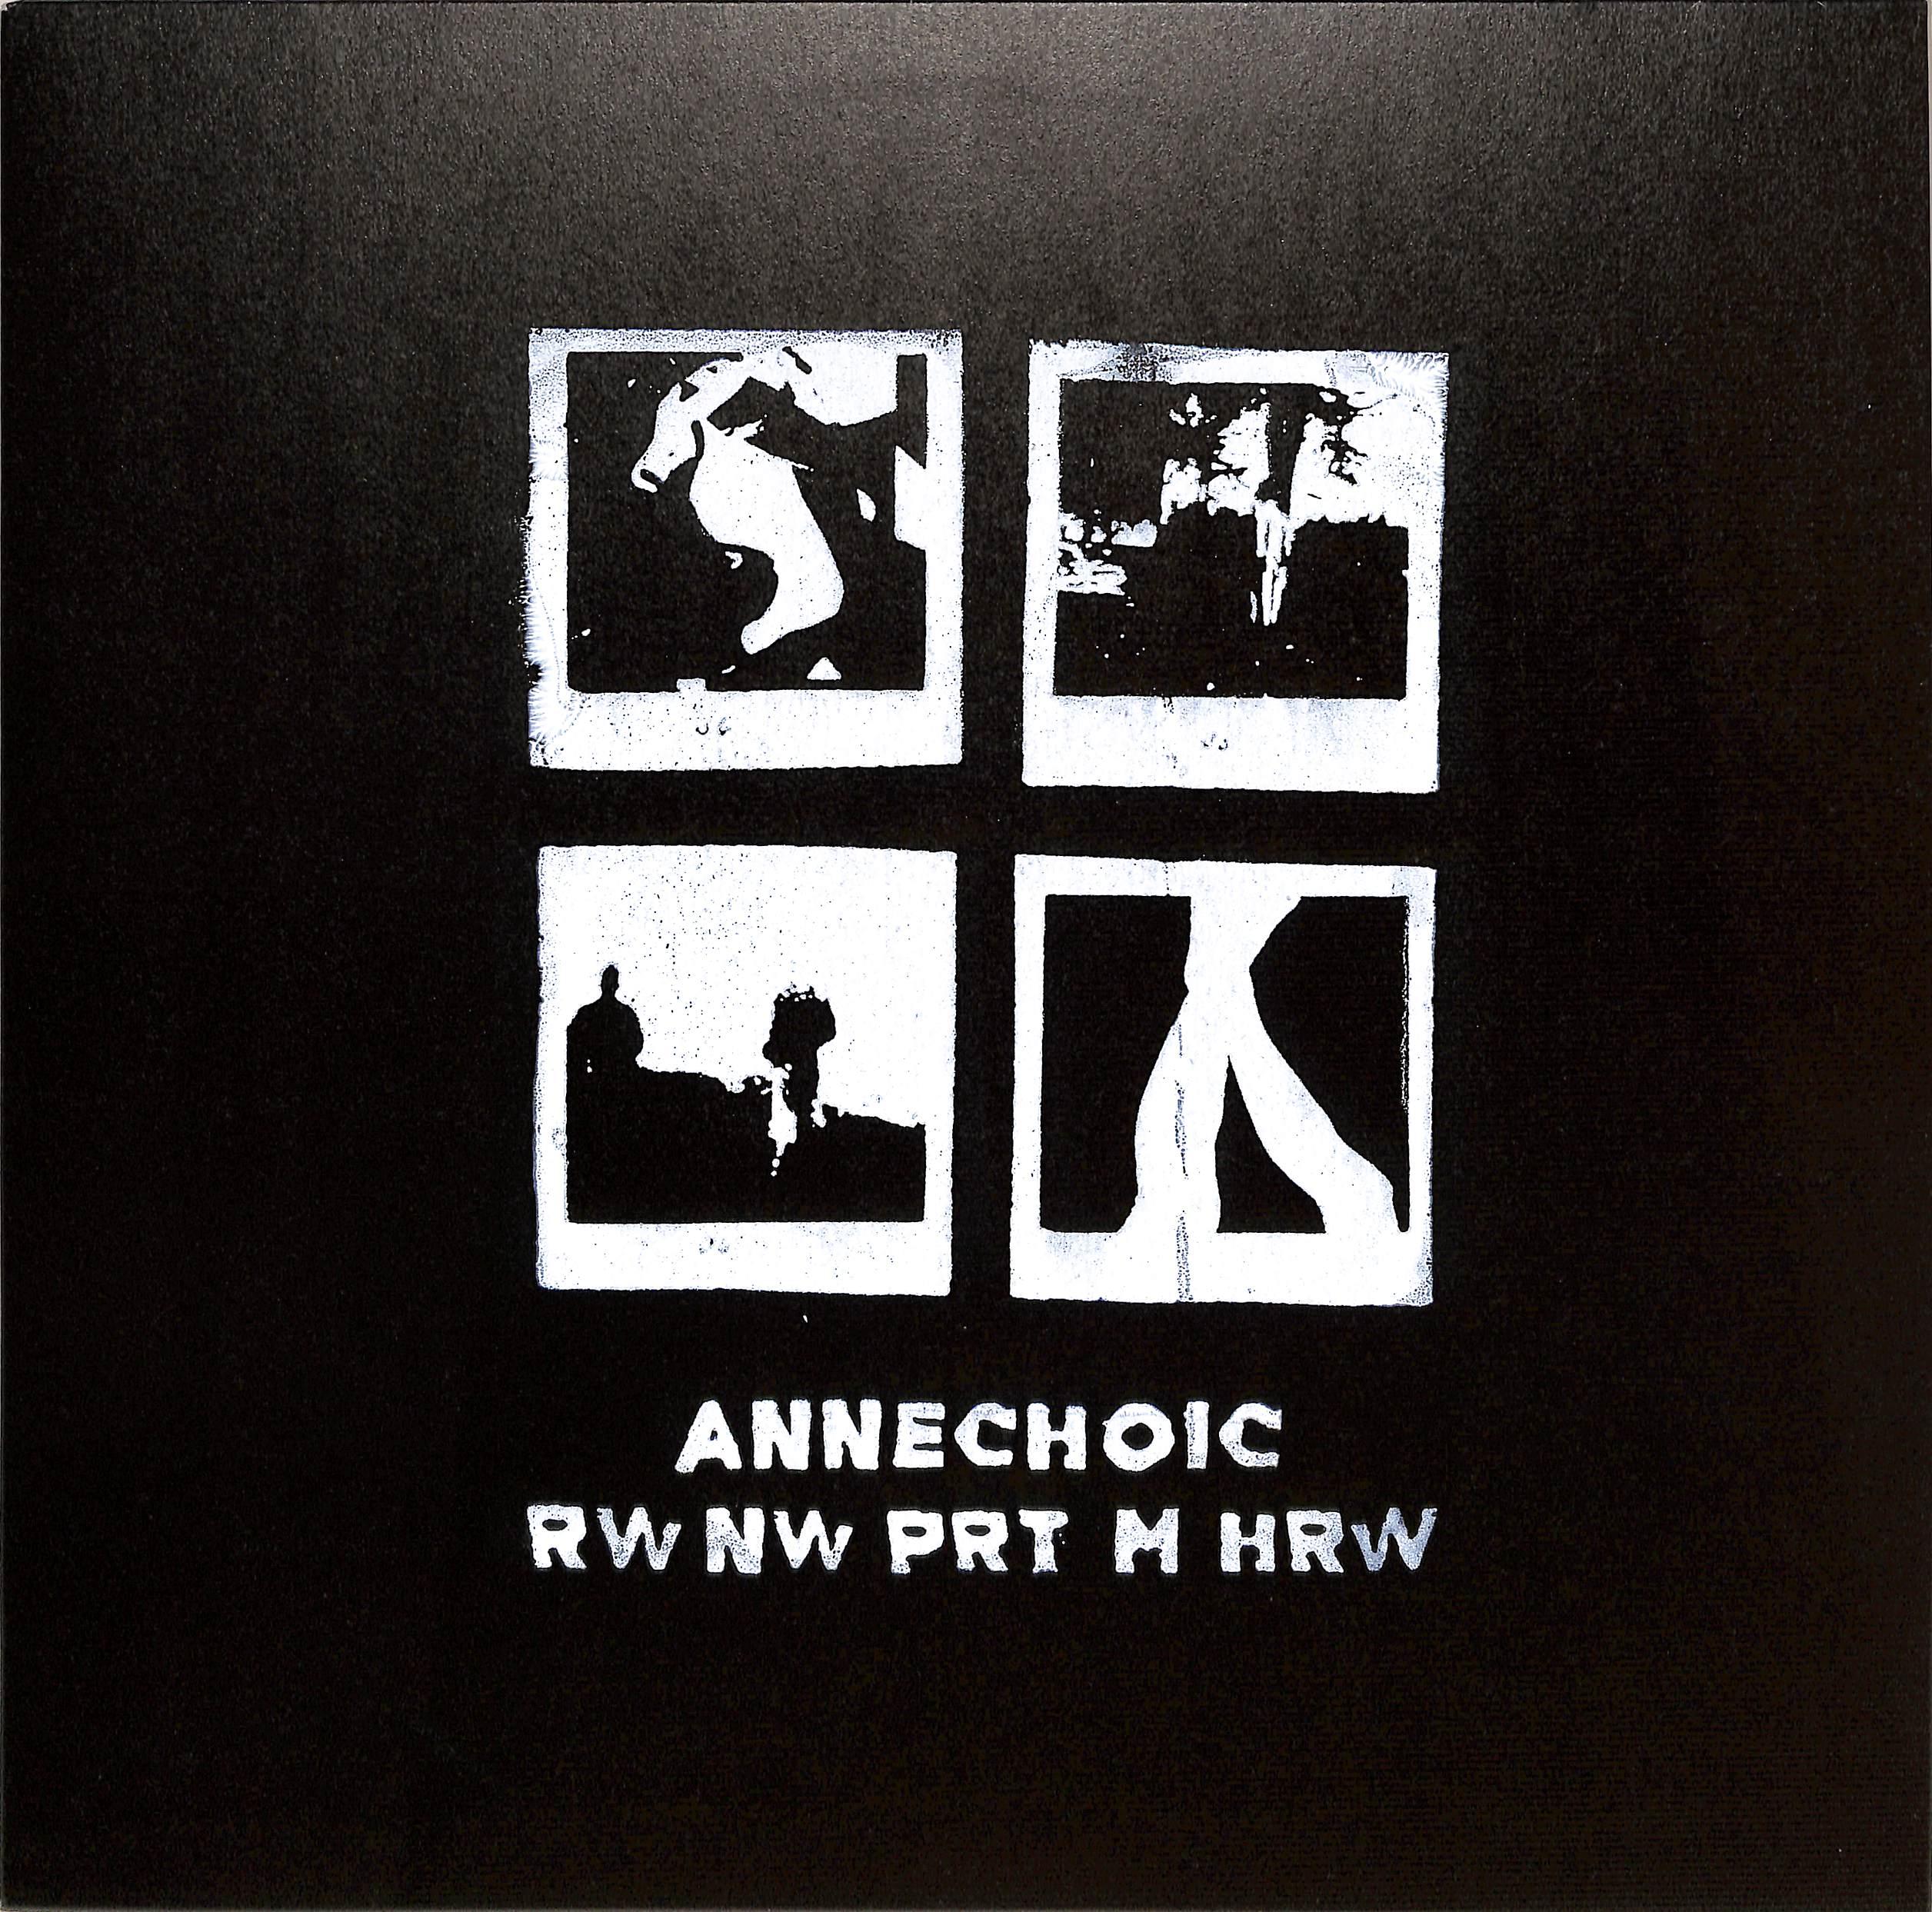 Annechoic - RW NW PRT M HRW